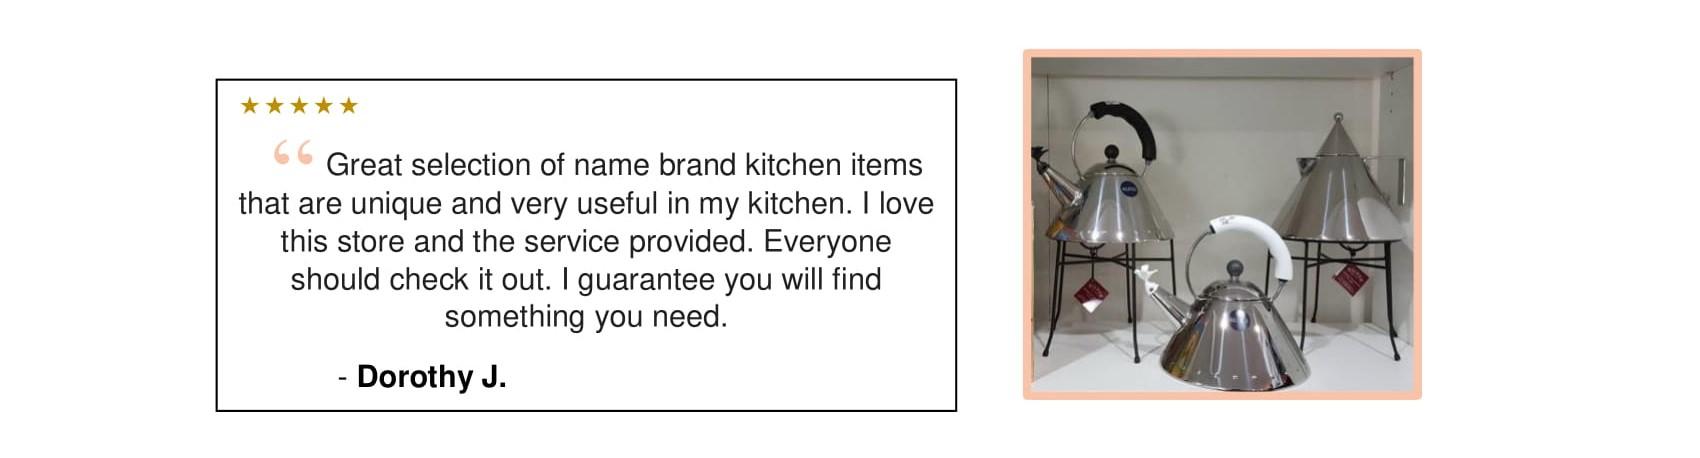 customer-testimonial-2.jpg